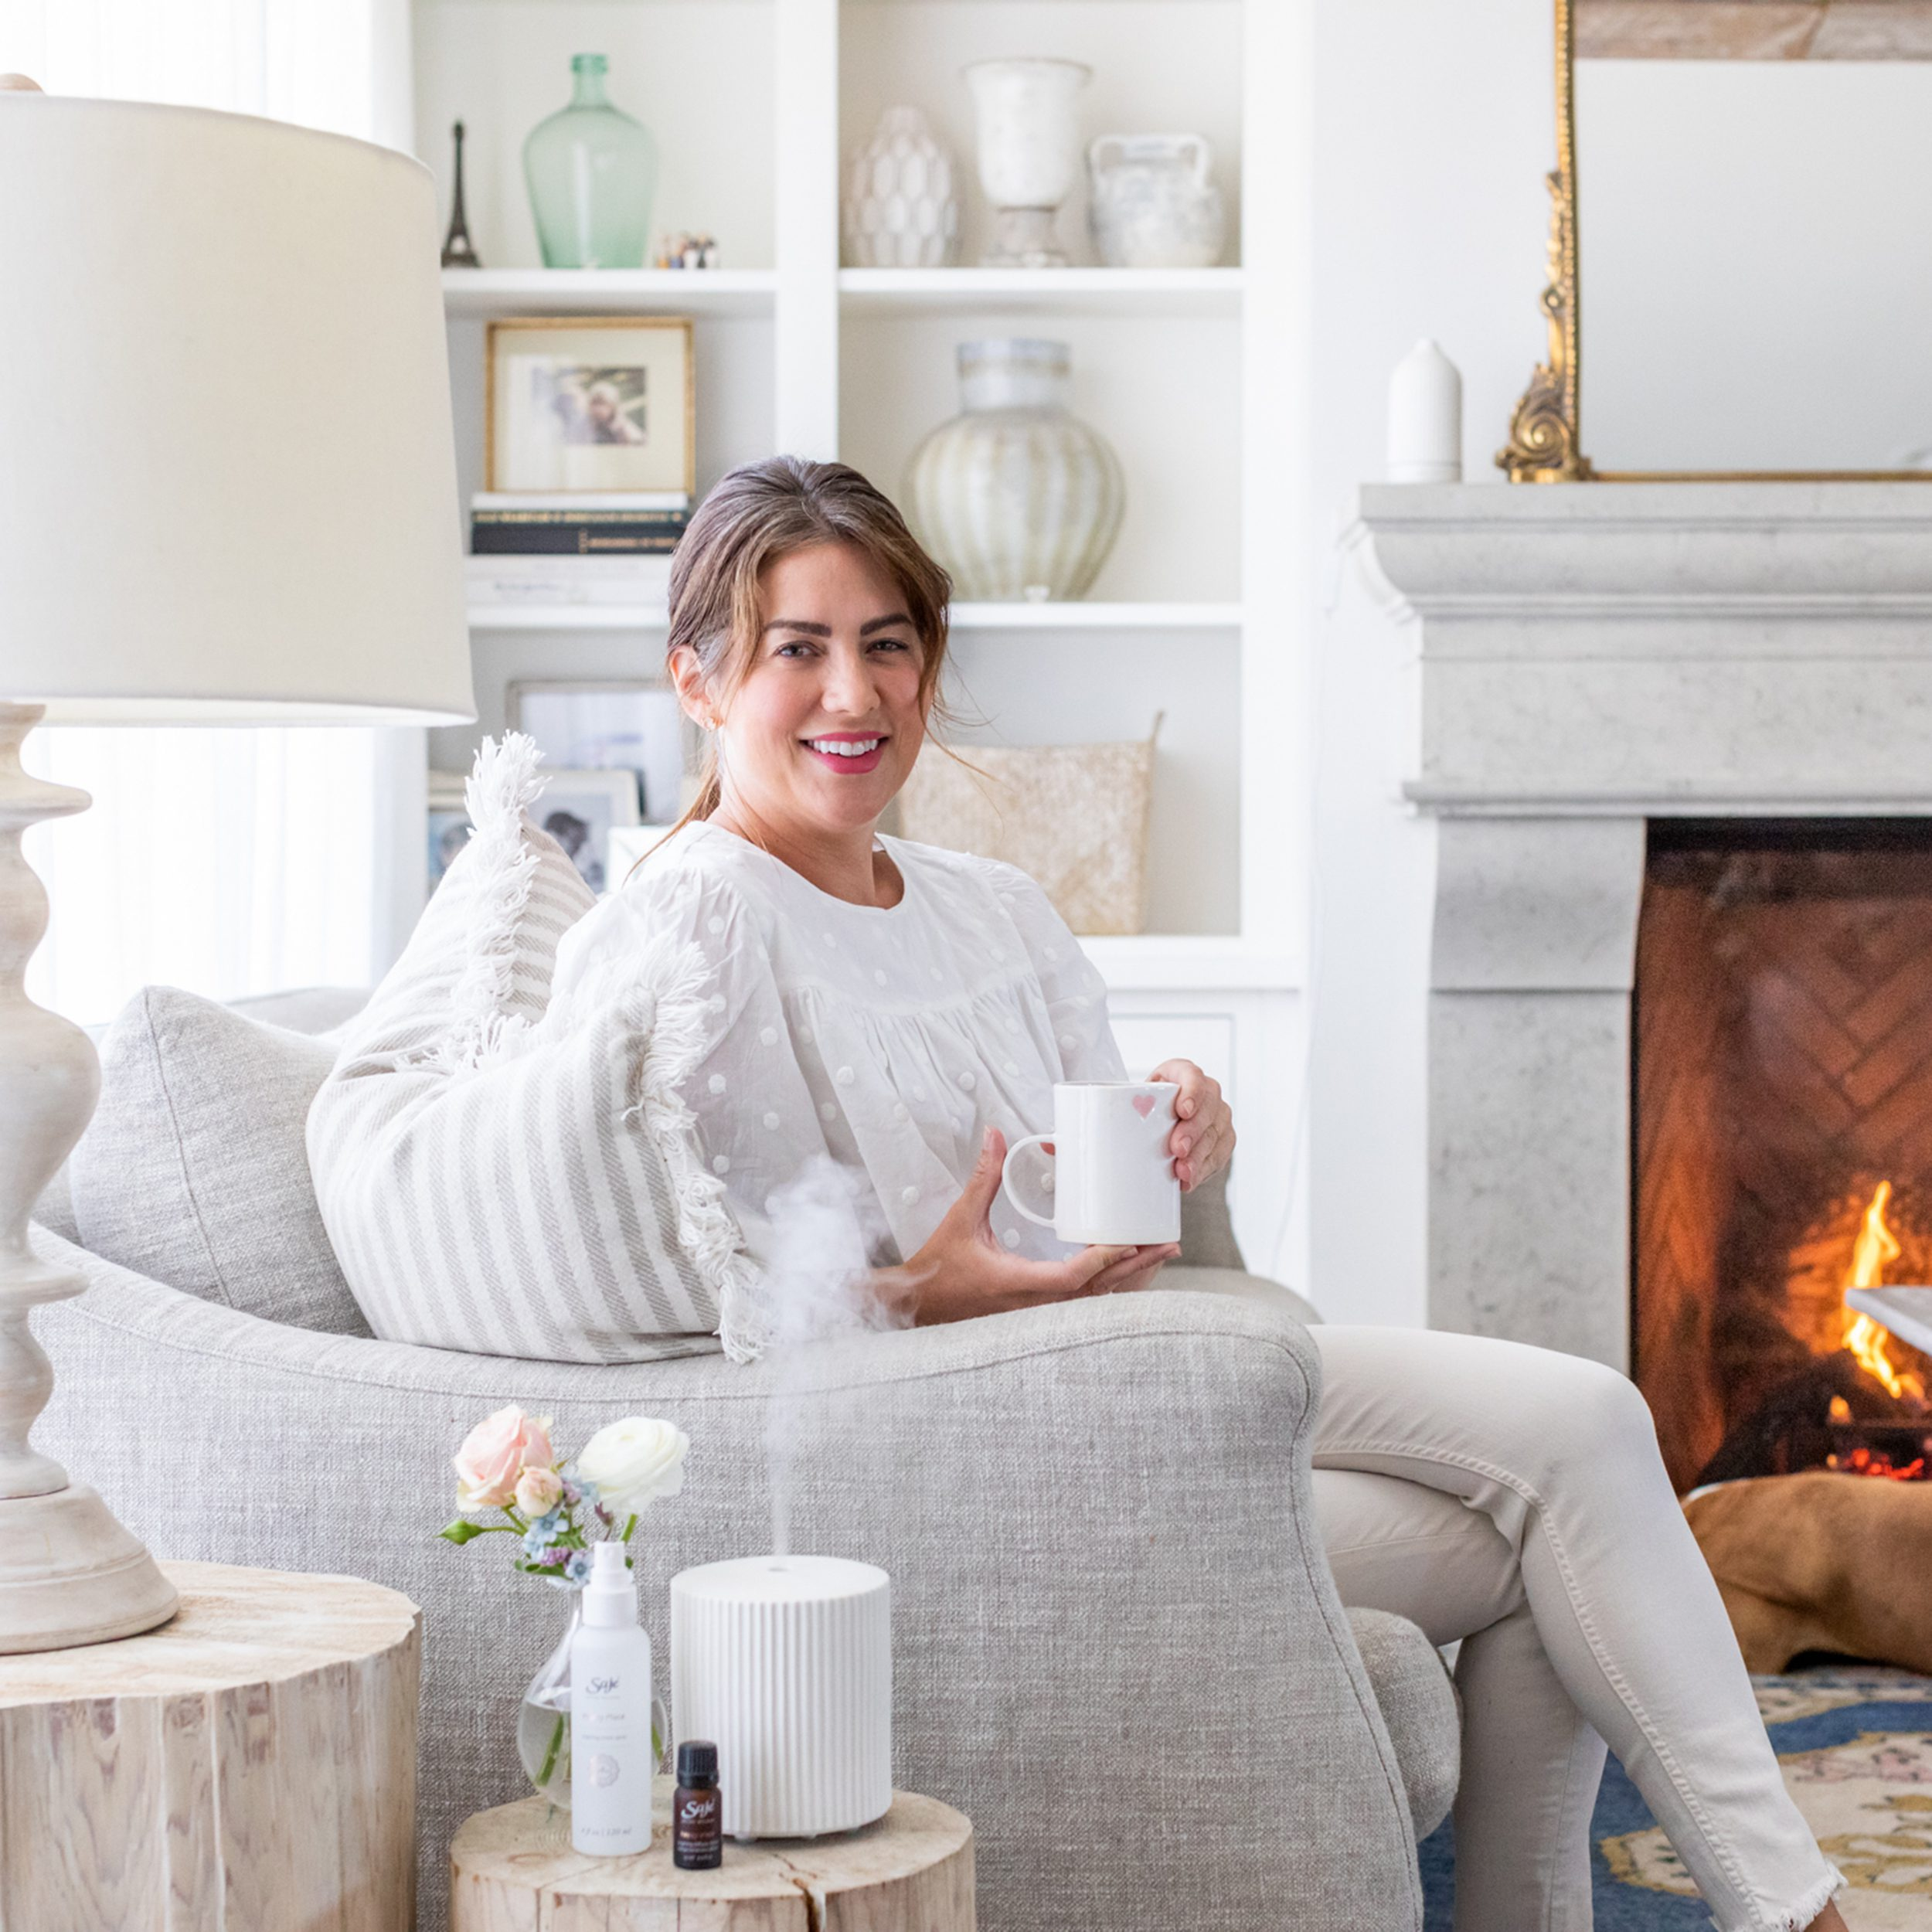 Saje Wellness and Jillian Harris Diffuser Launch